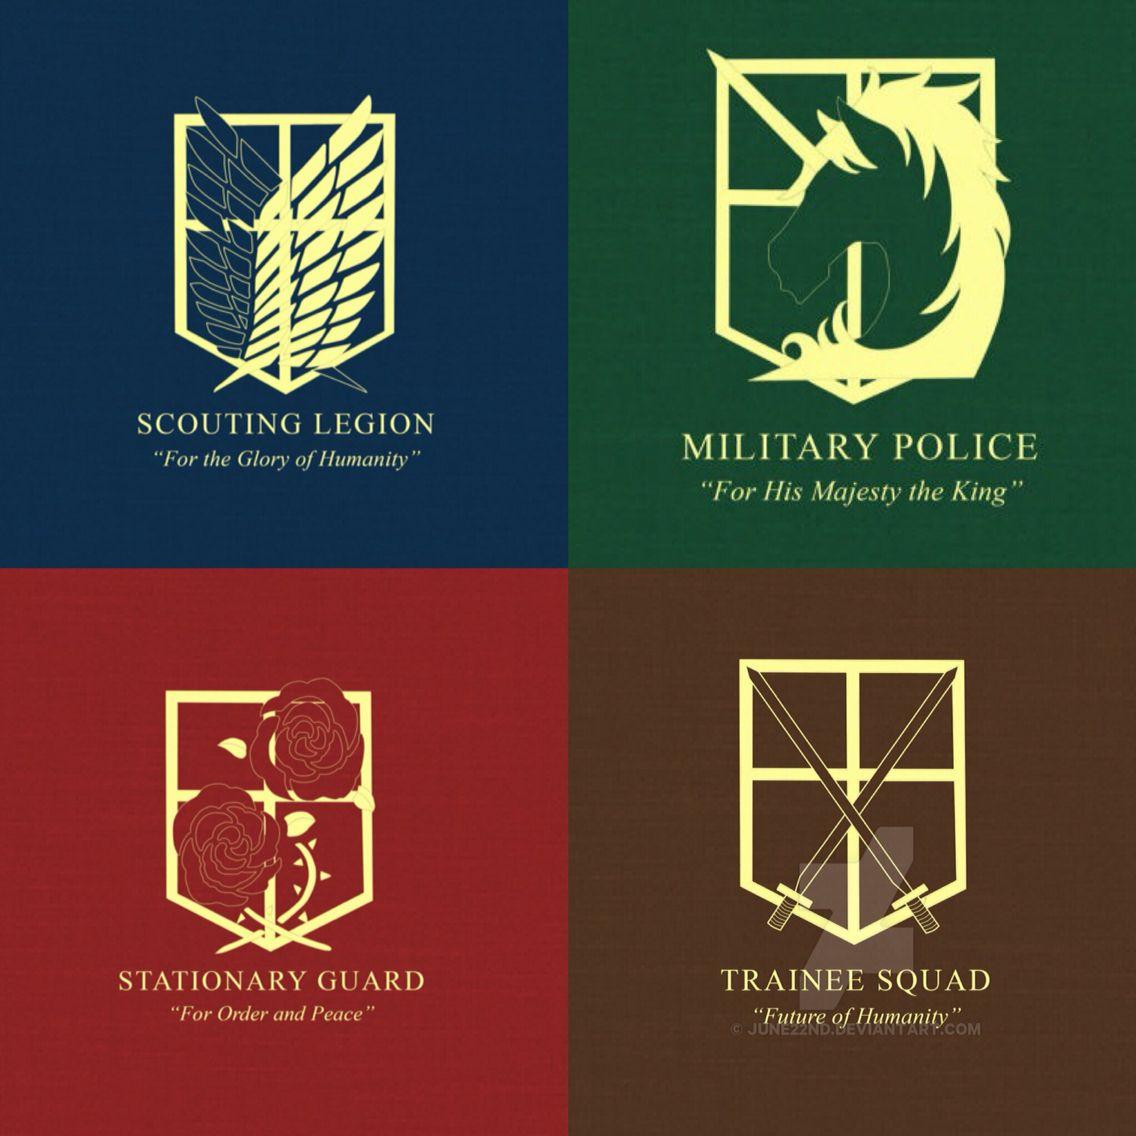 Scout Regimen Military Police Stationary Guard And Trainee Squad Tropa De Exploracao Ataque Dos Titas Anime